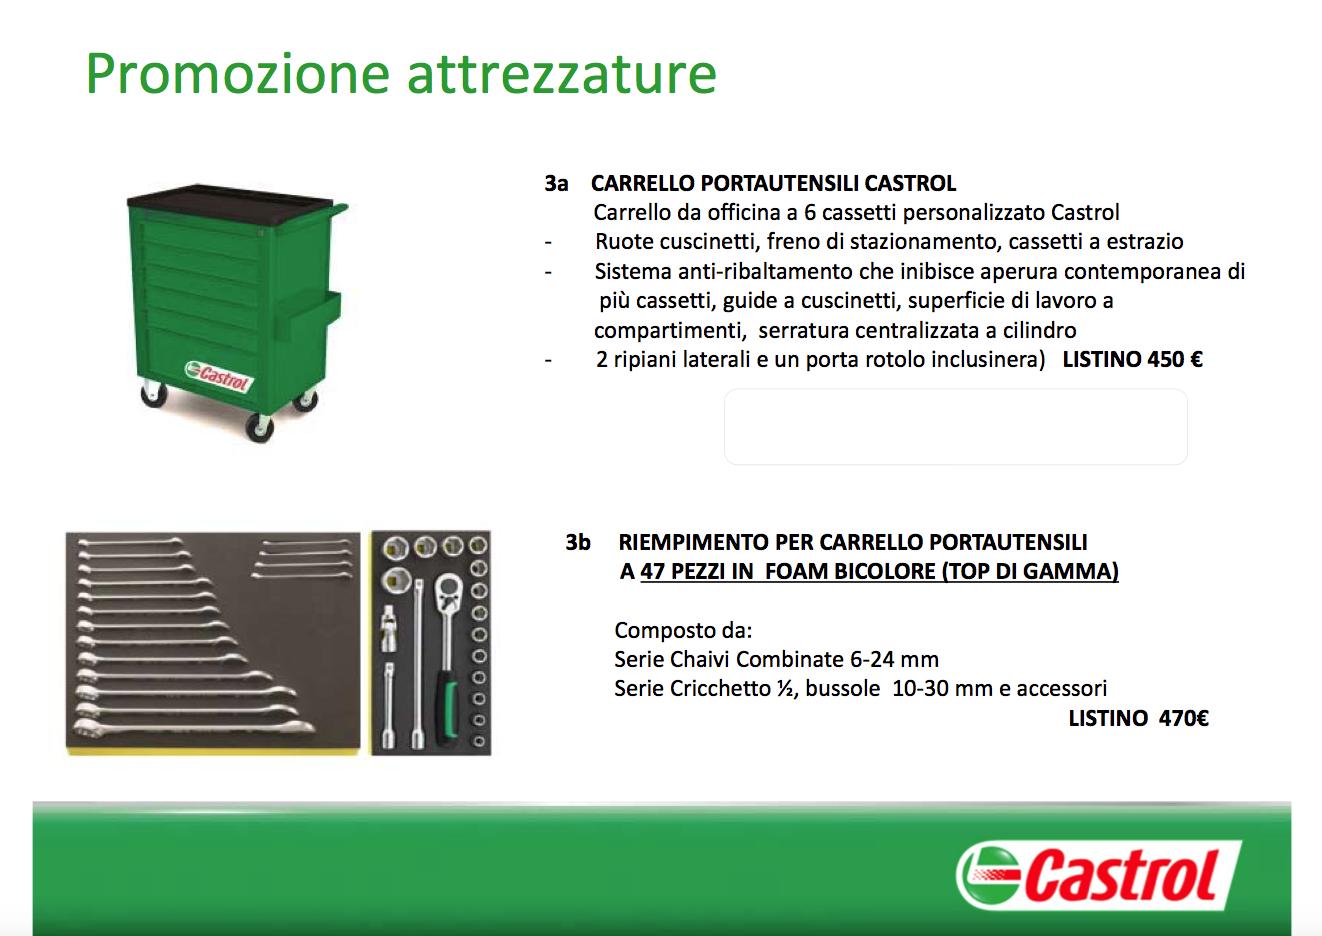 castrol-promo1